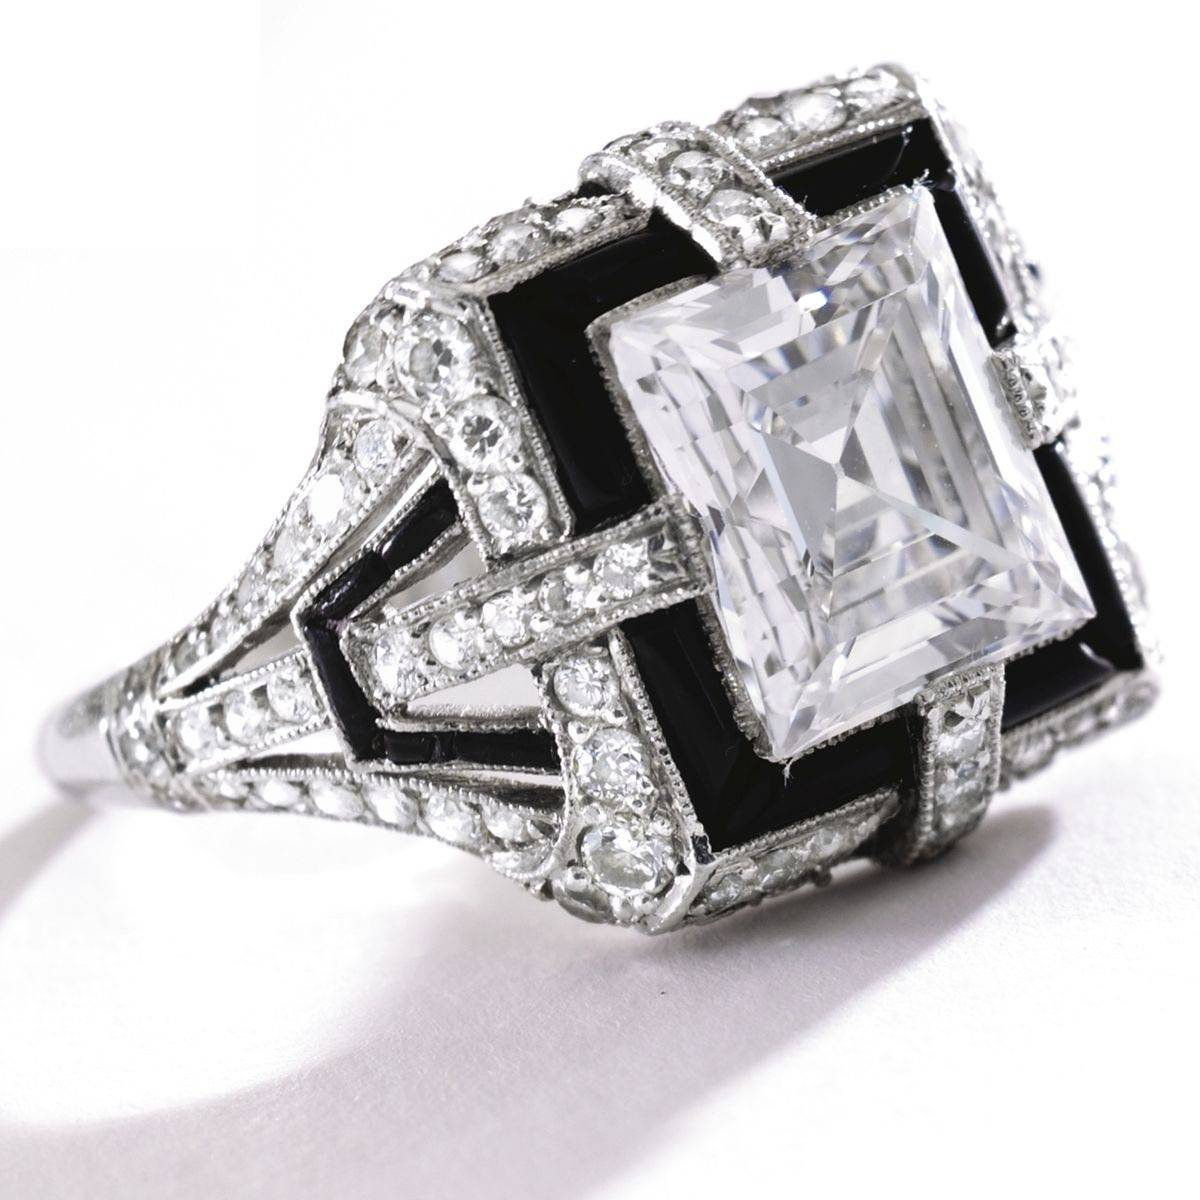 Art deco jewelry-700028335811003721